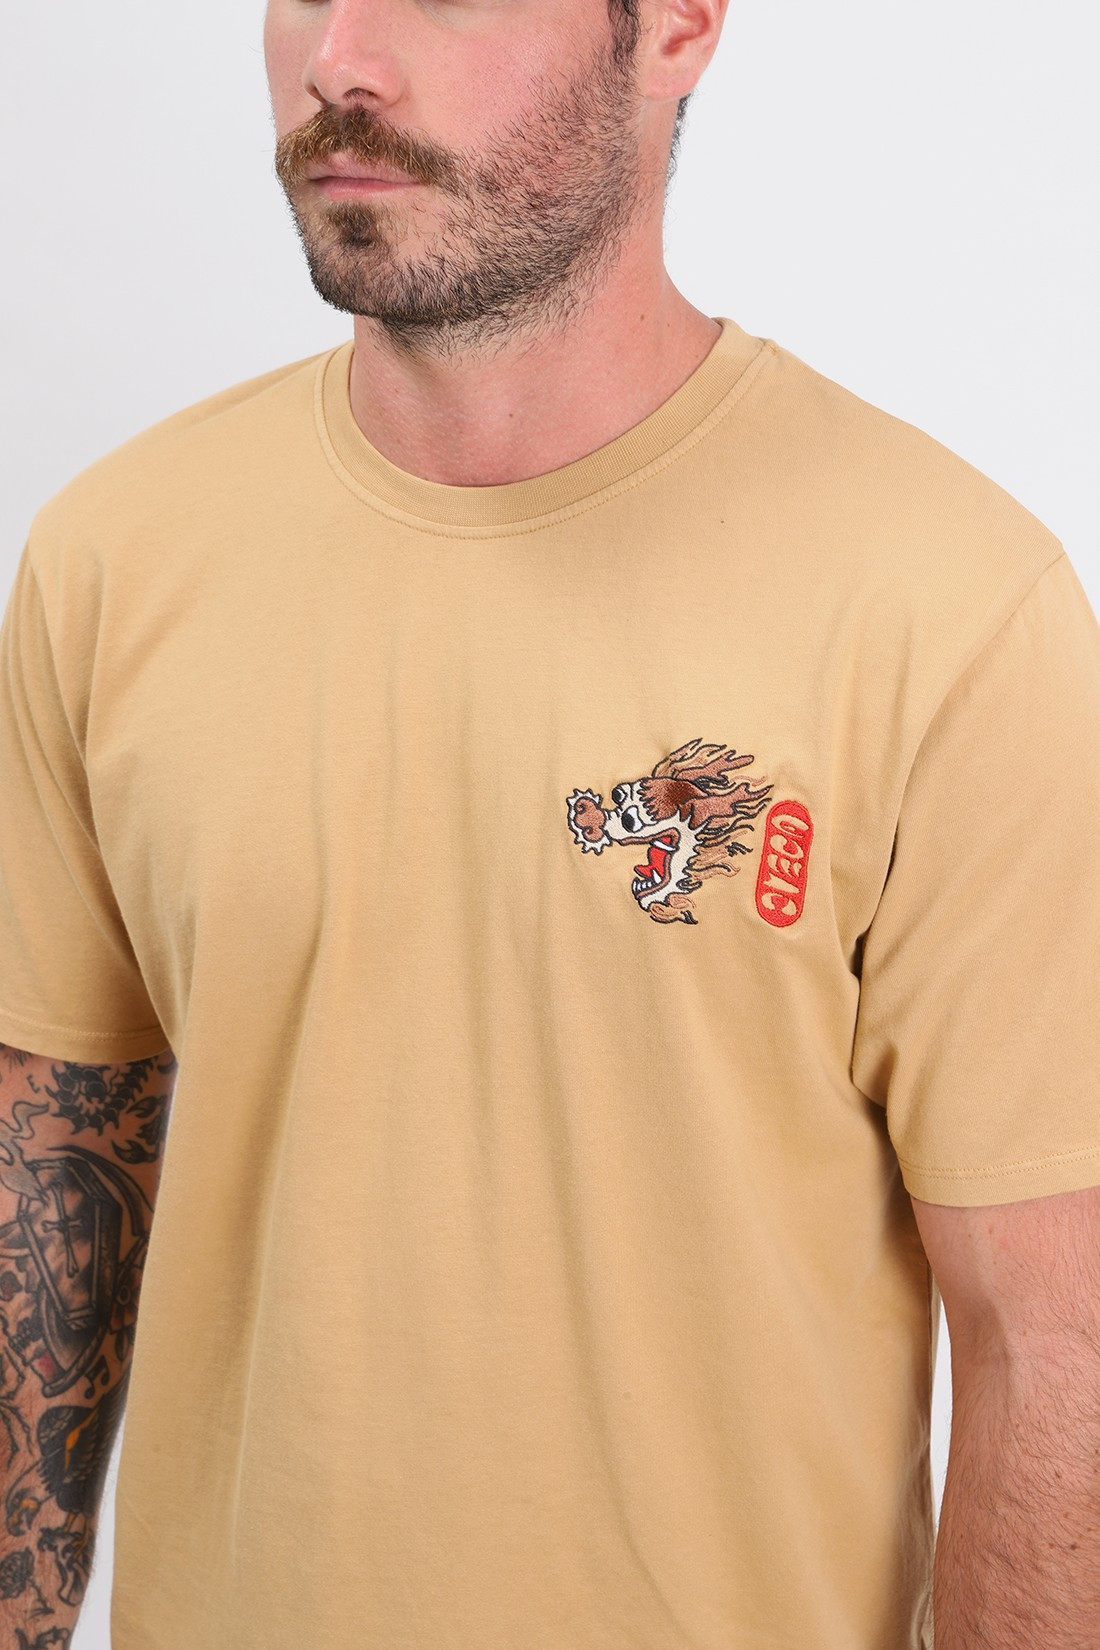 EDWIN / Dragon tee shirt Rabbits